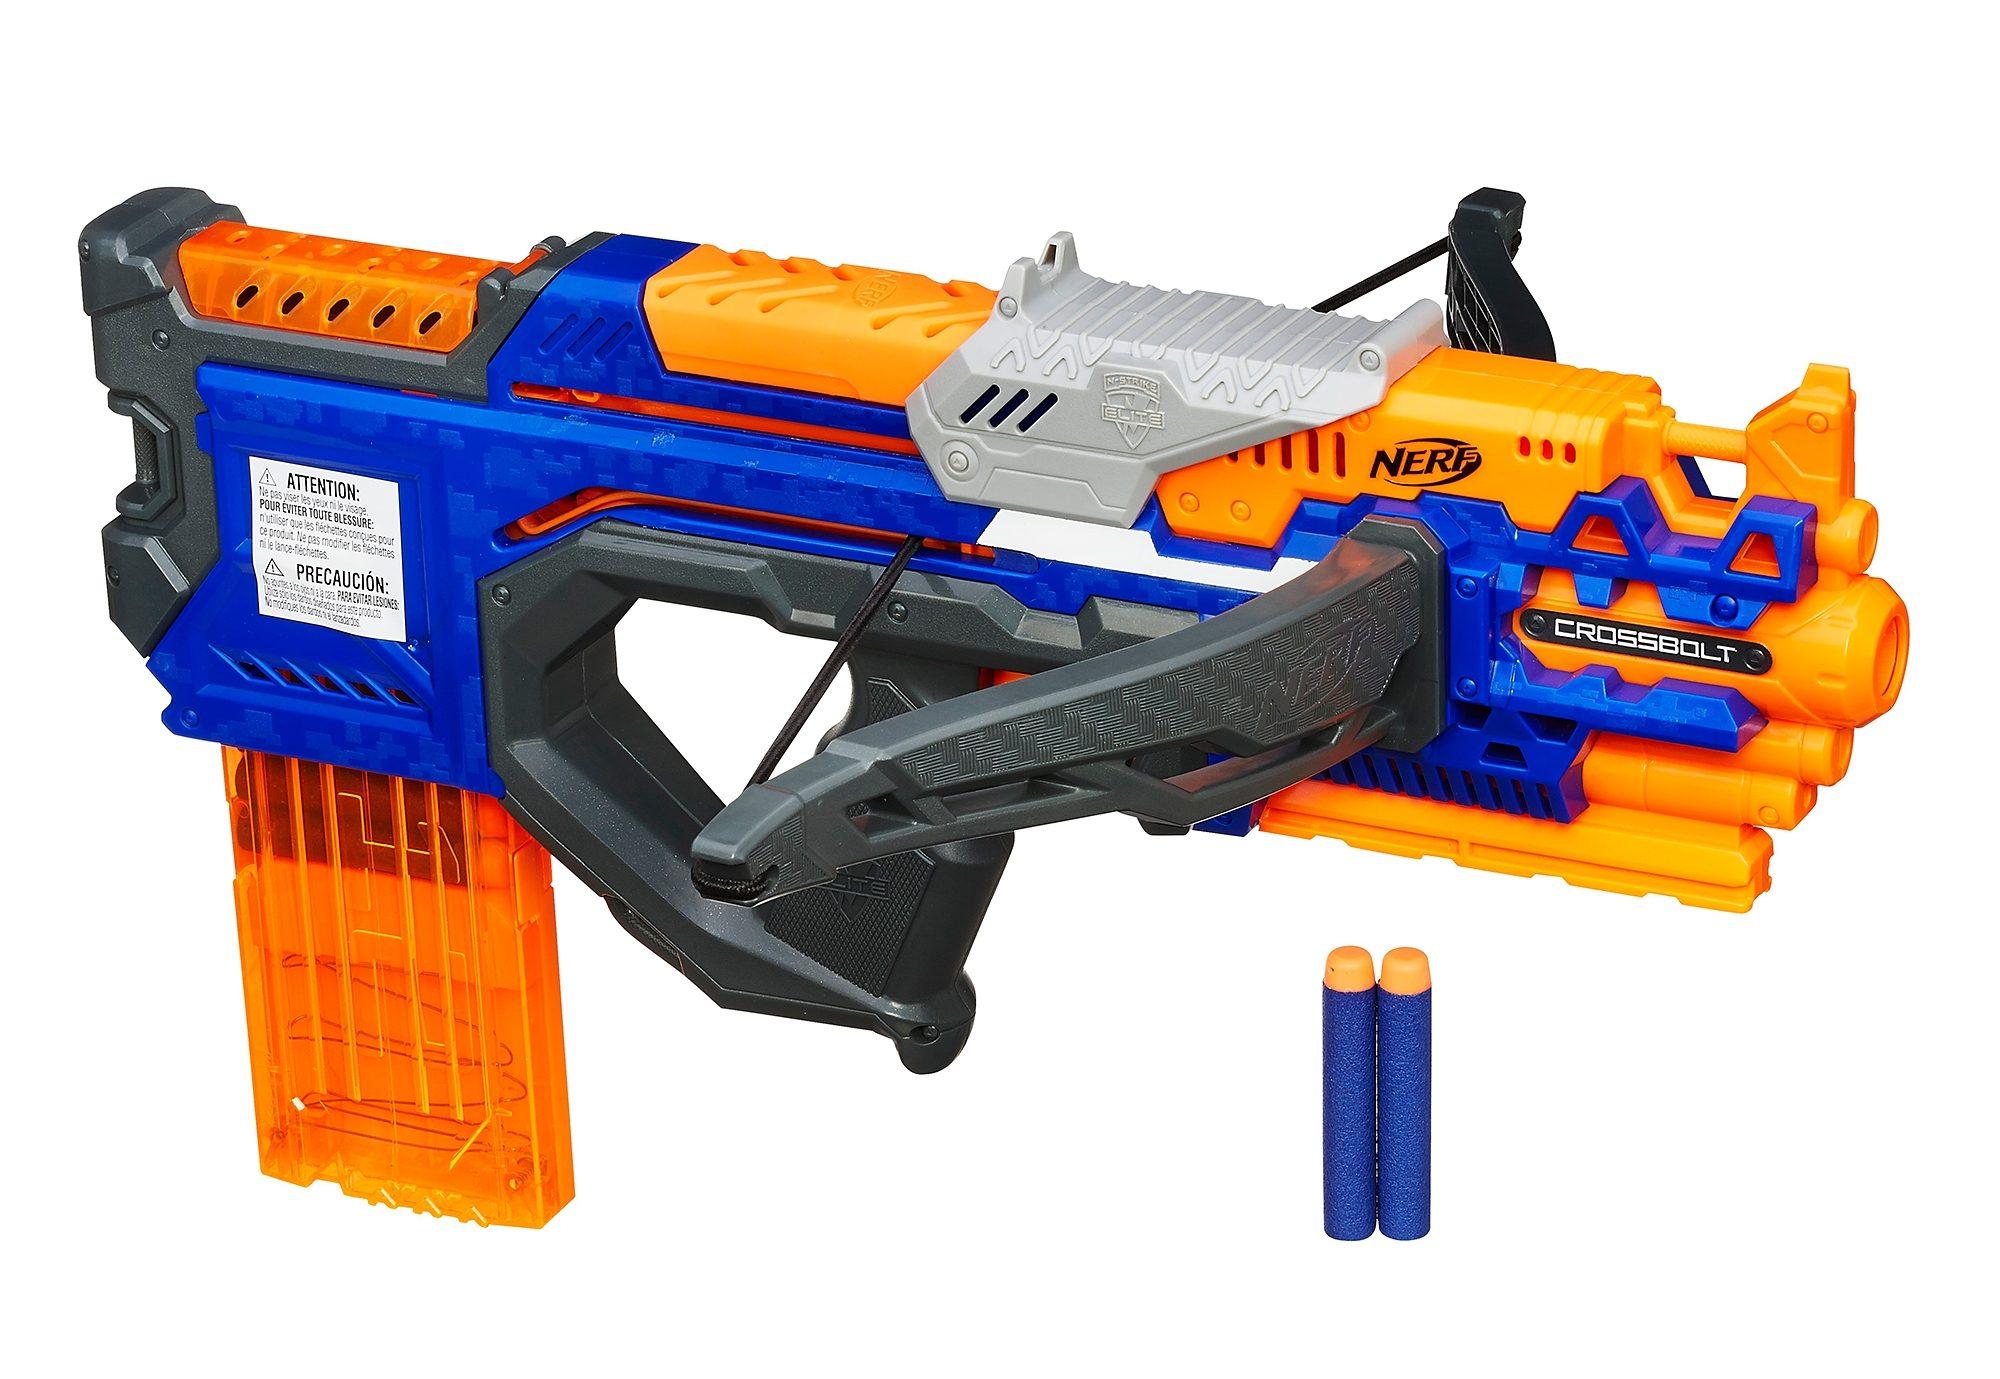 Hasbro Armbrust »NERF N-Strike Elite XD CrossBolt«